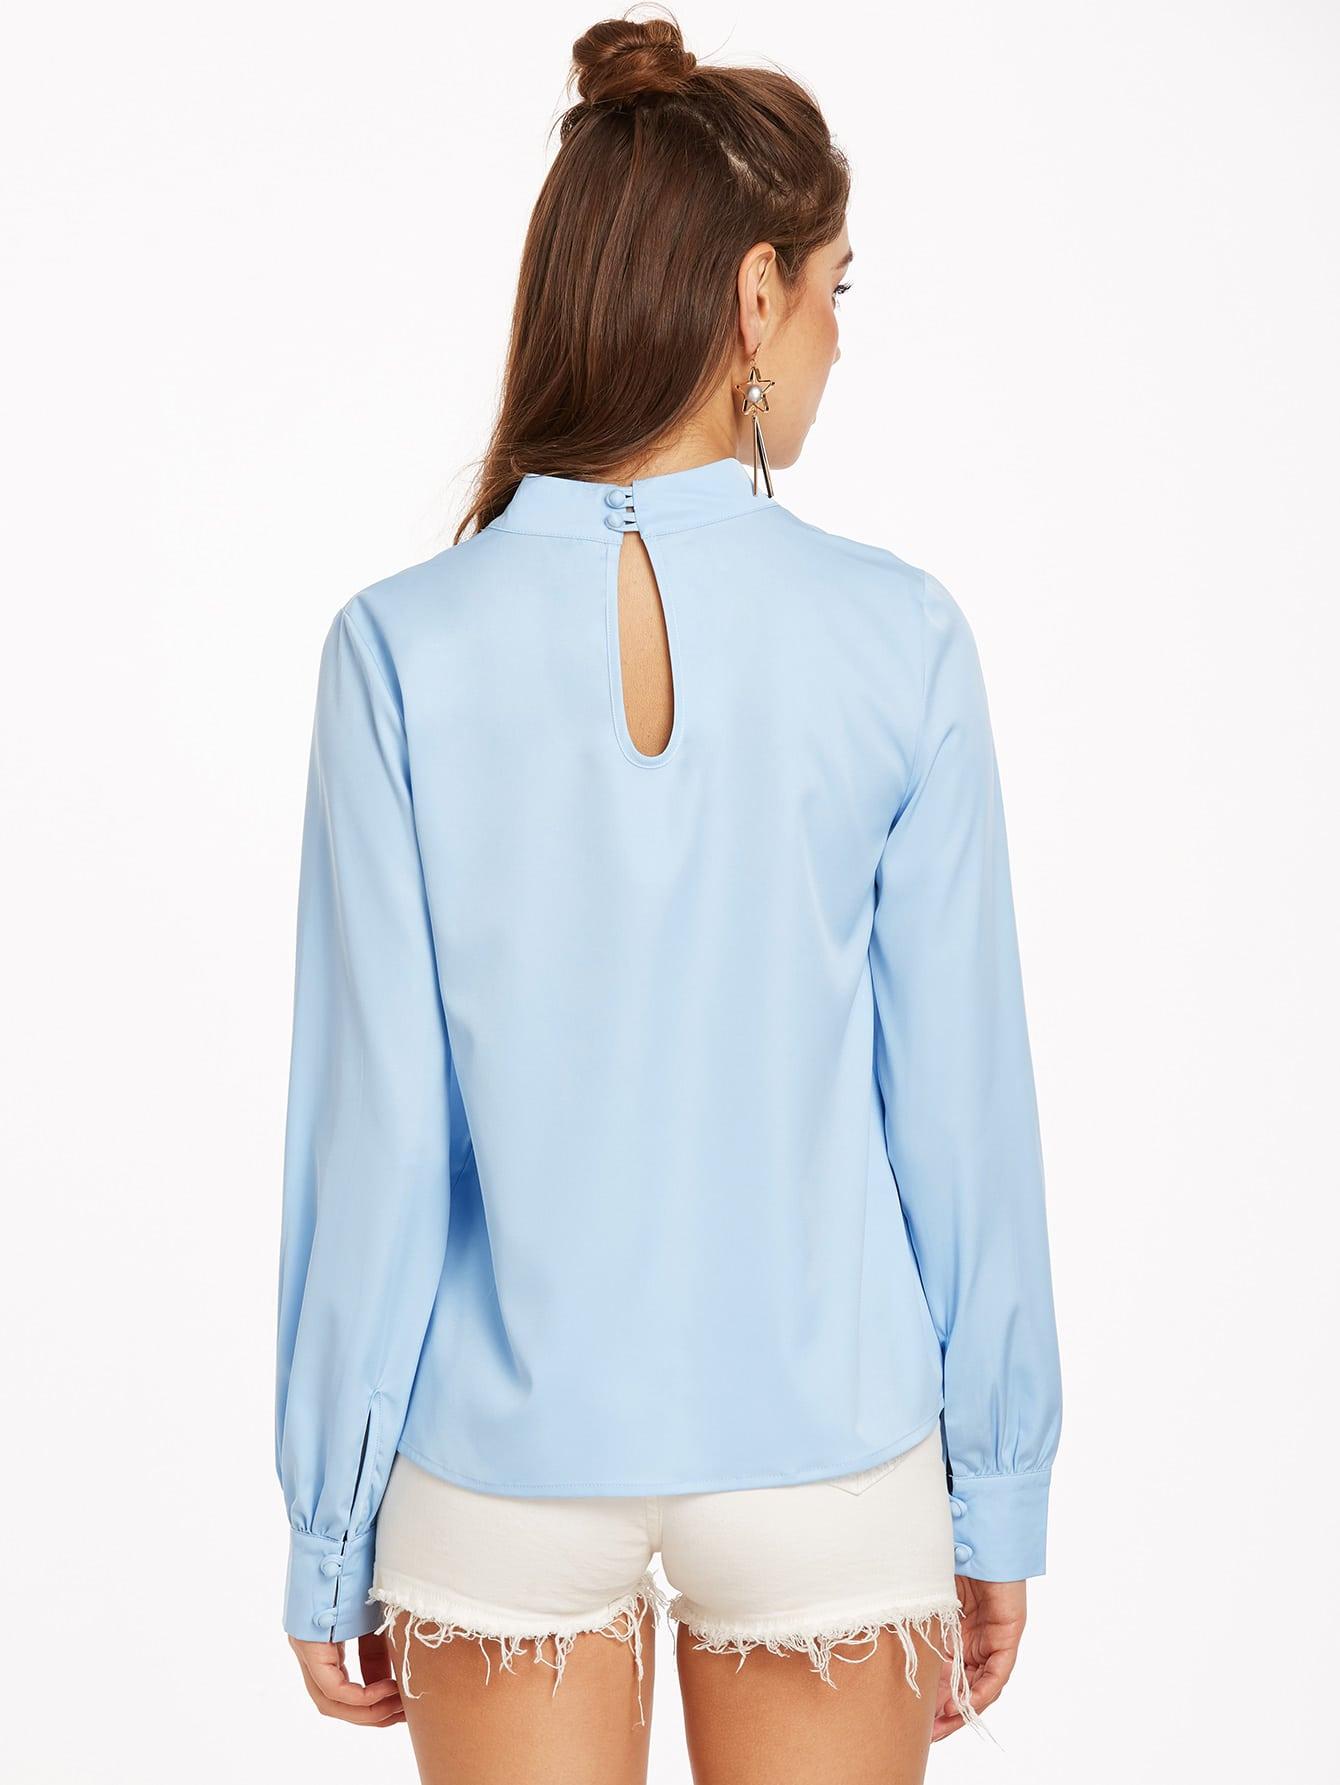 blouse161125452_2